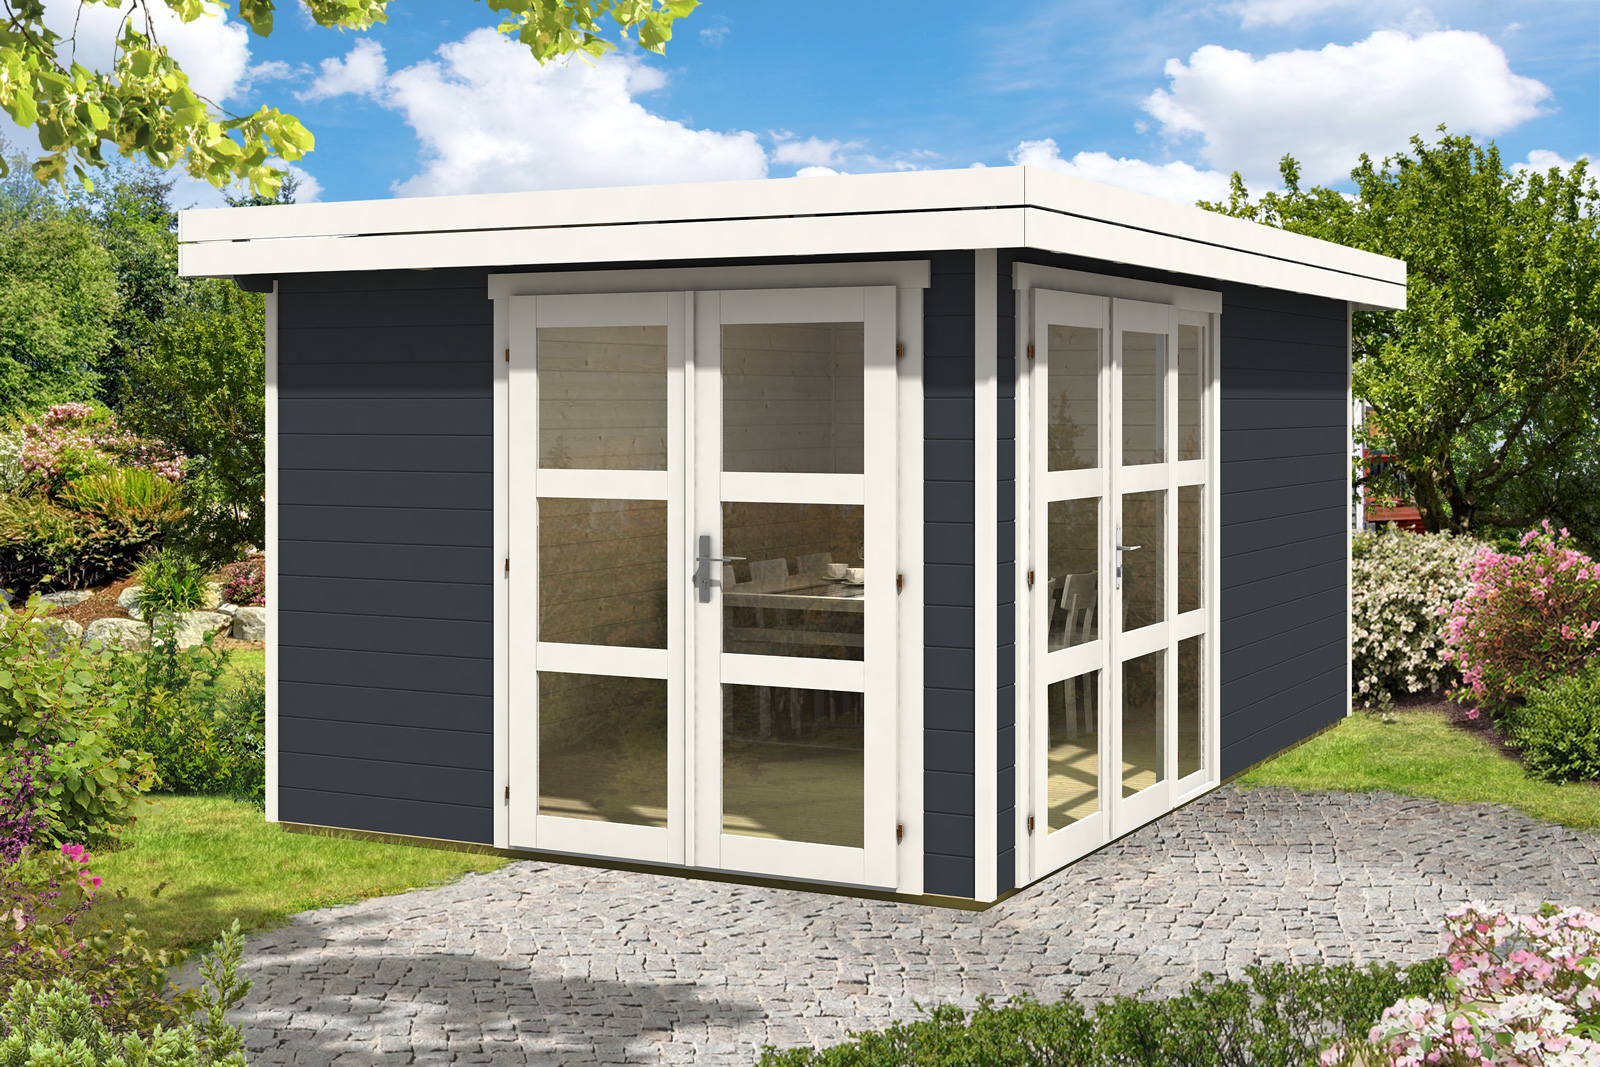 b ware gartenhaus luxor 28. Black Bedroom Furniture Sets. Home Design Ideas